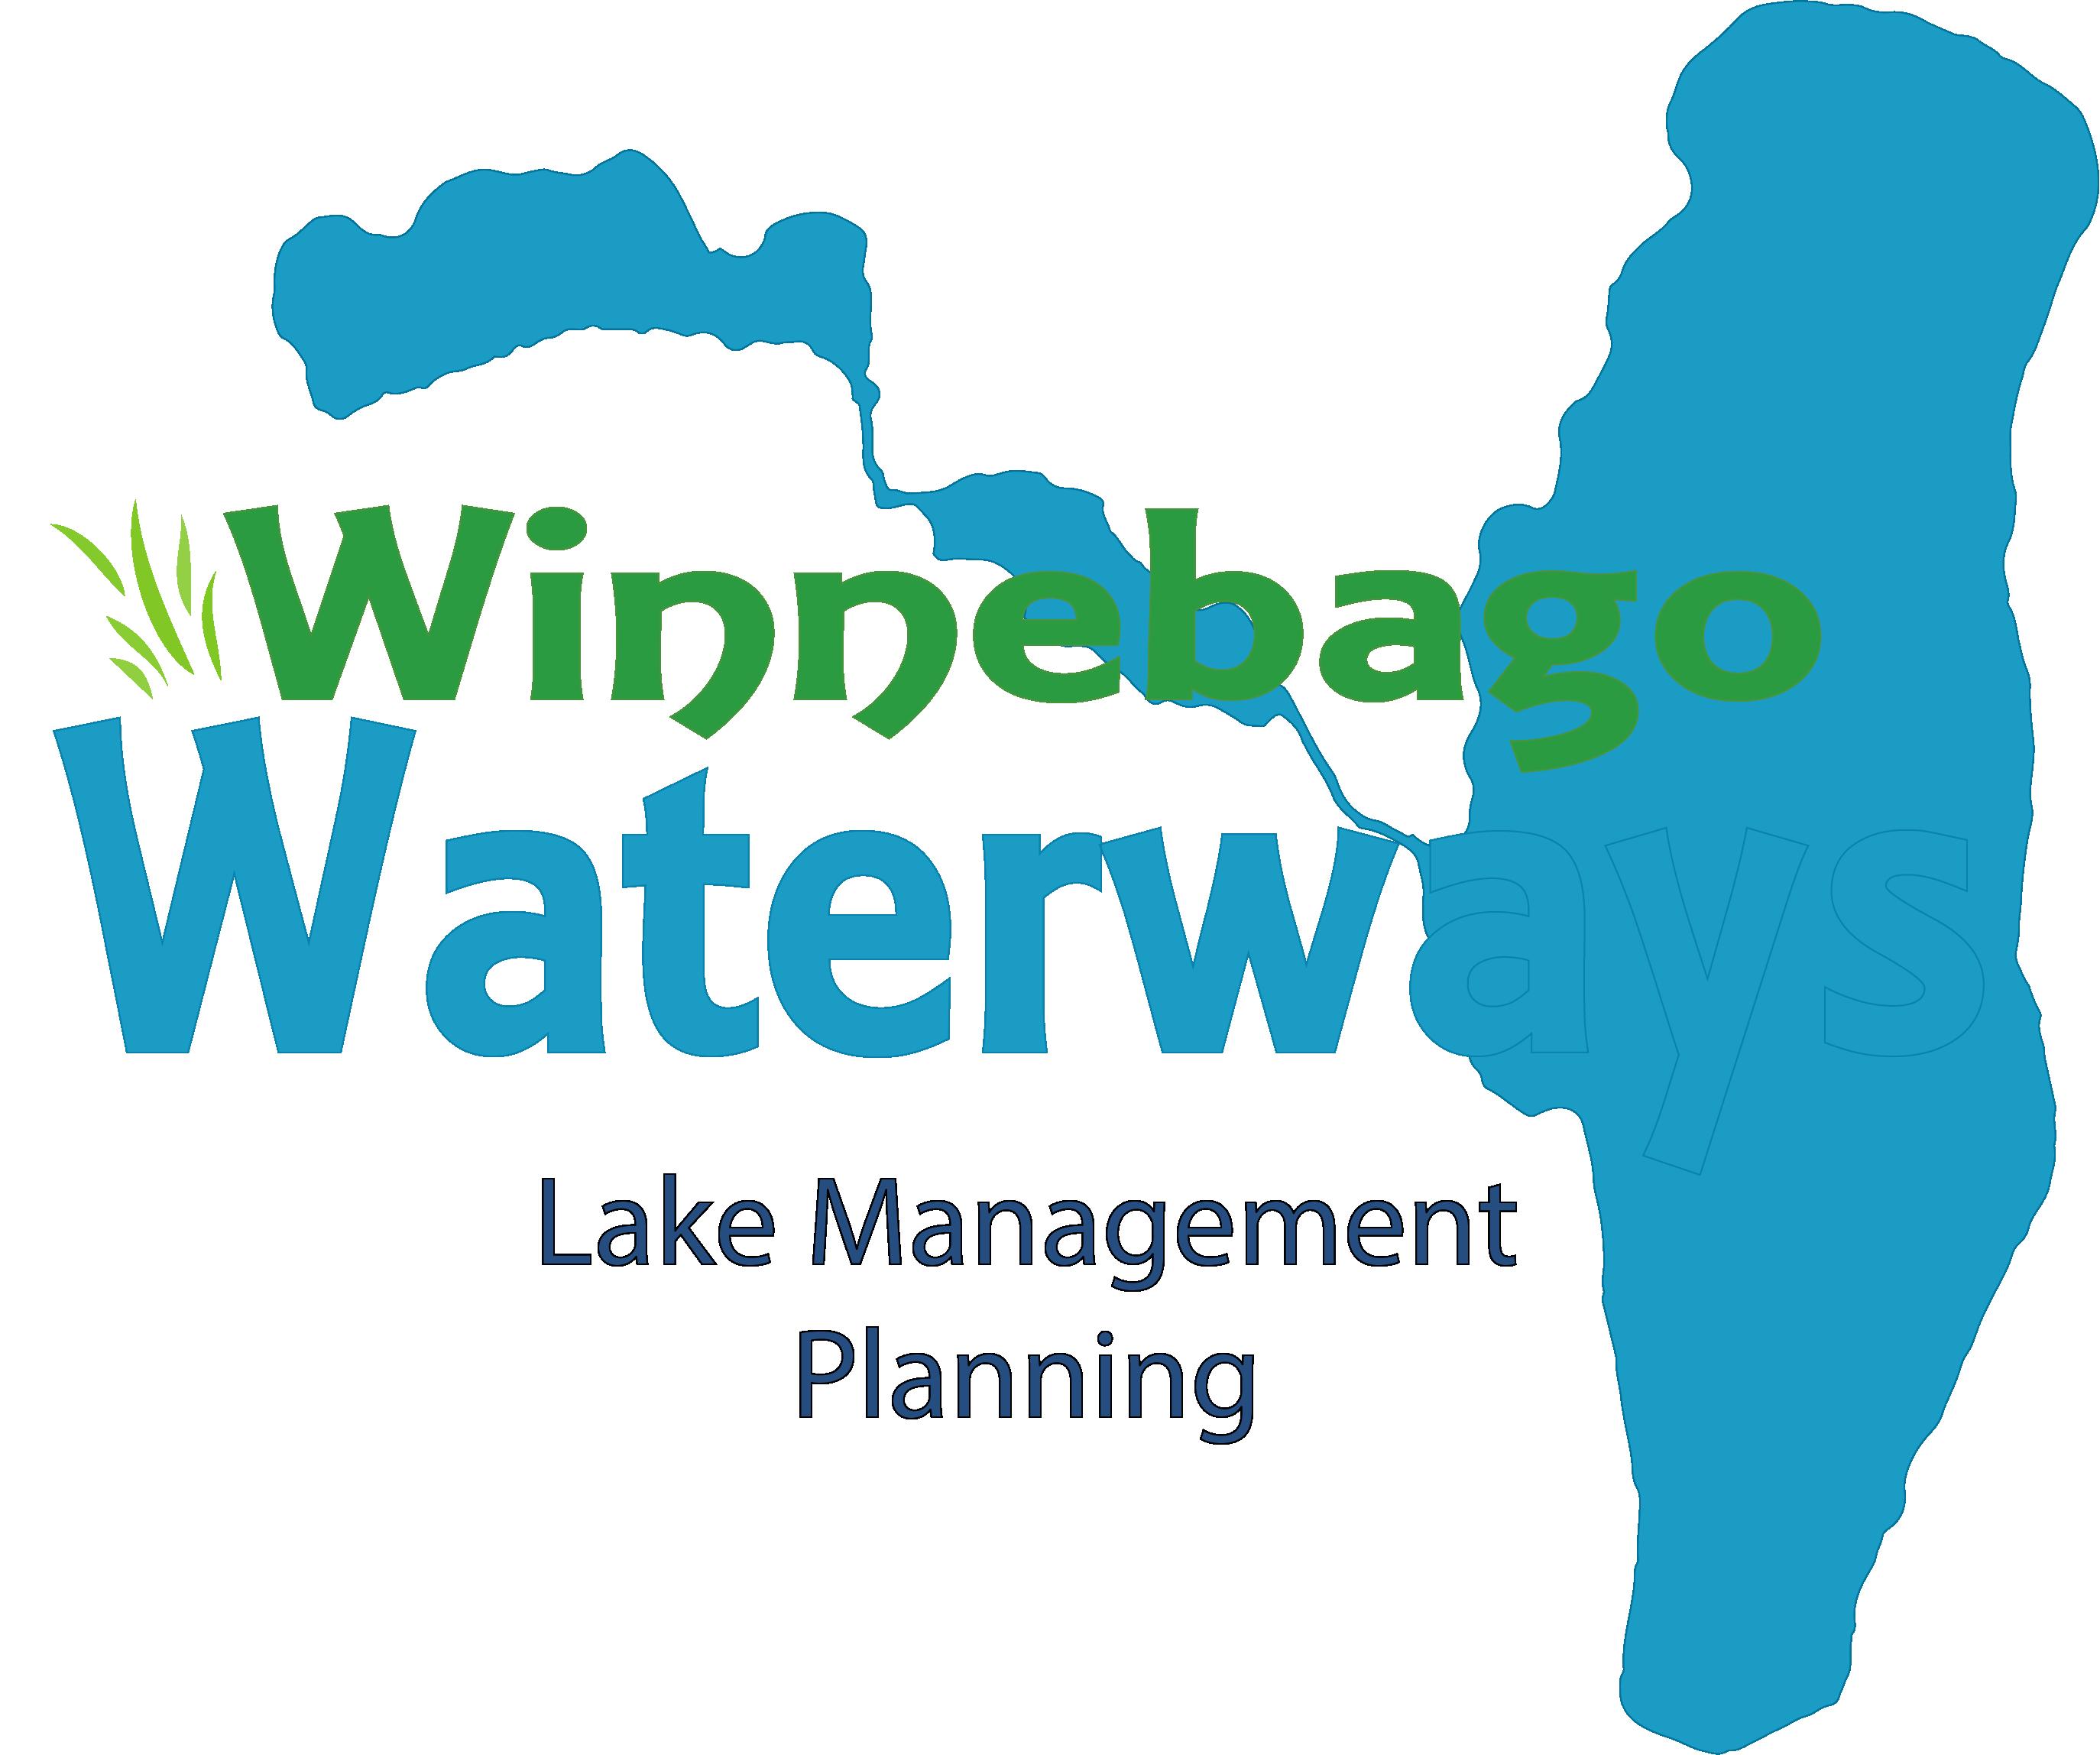 Lake Management Planning – 2017 Highlights